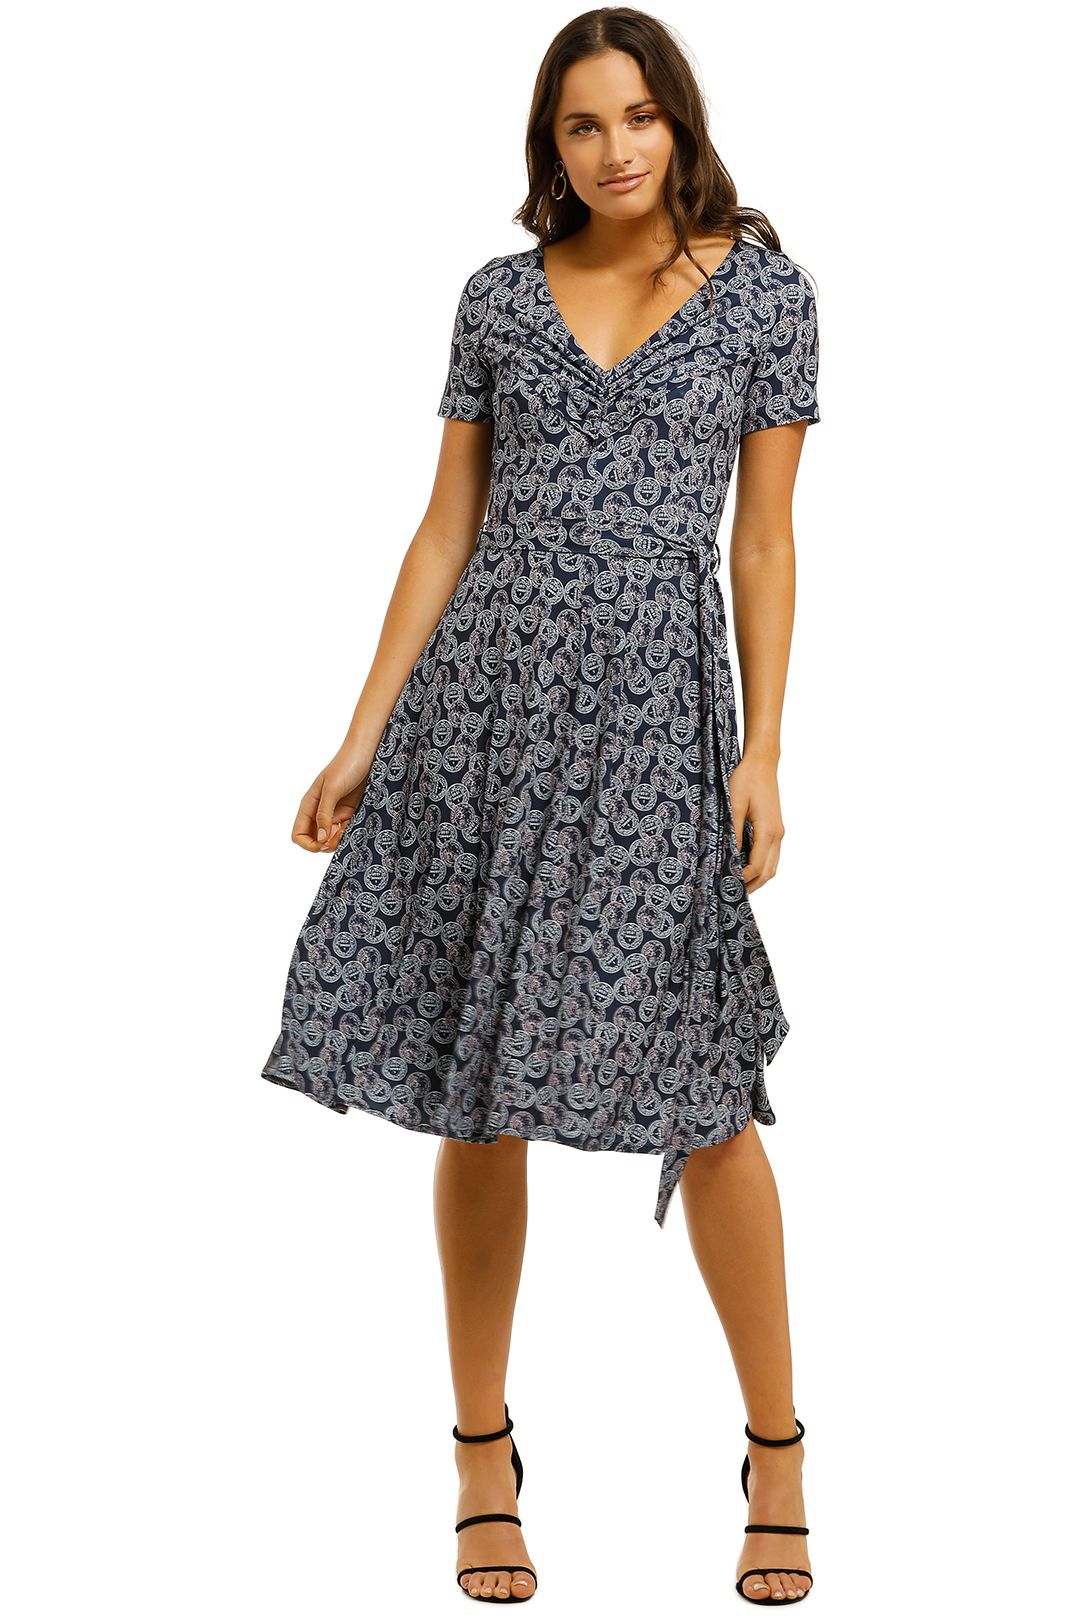 Leona-Edmiston-Nancy-Dress-Print-Jersey-Front